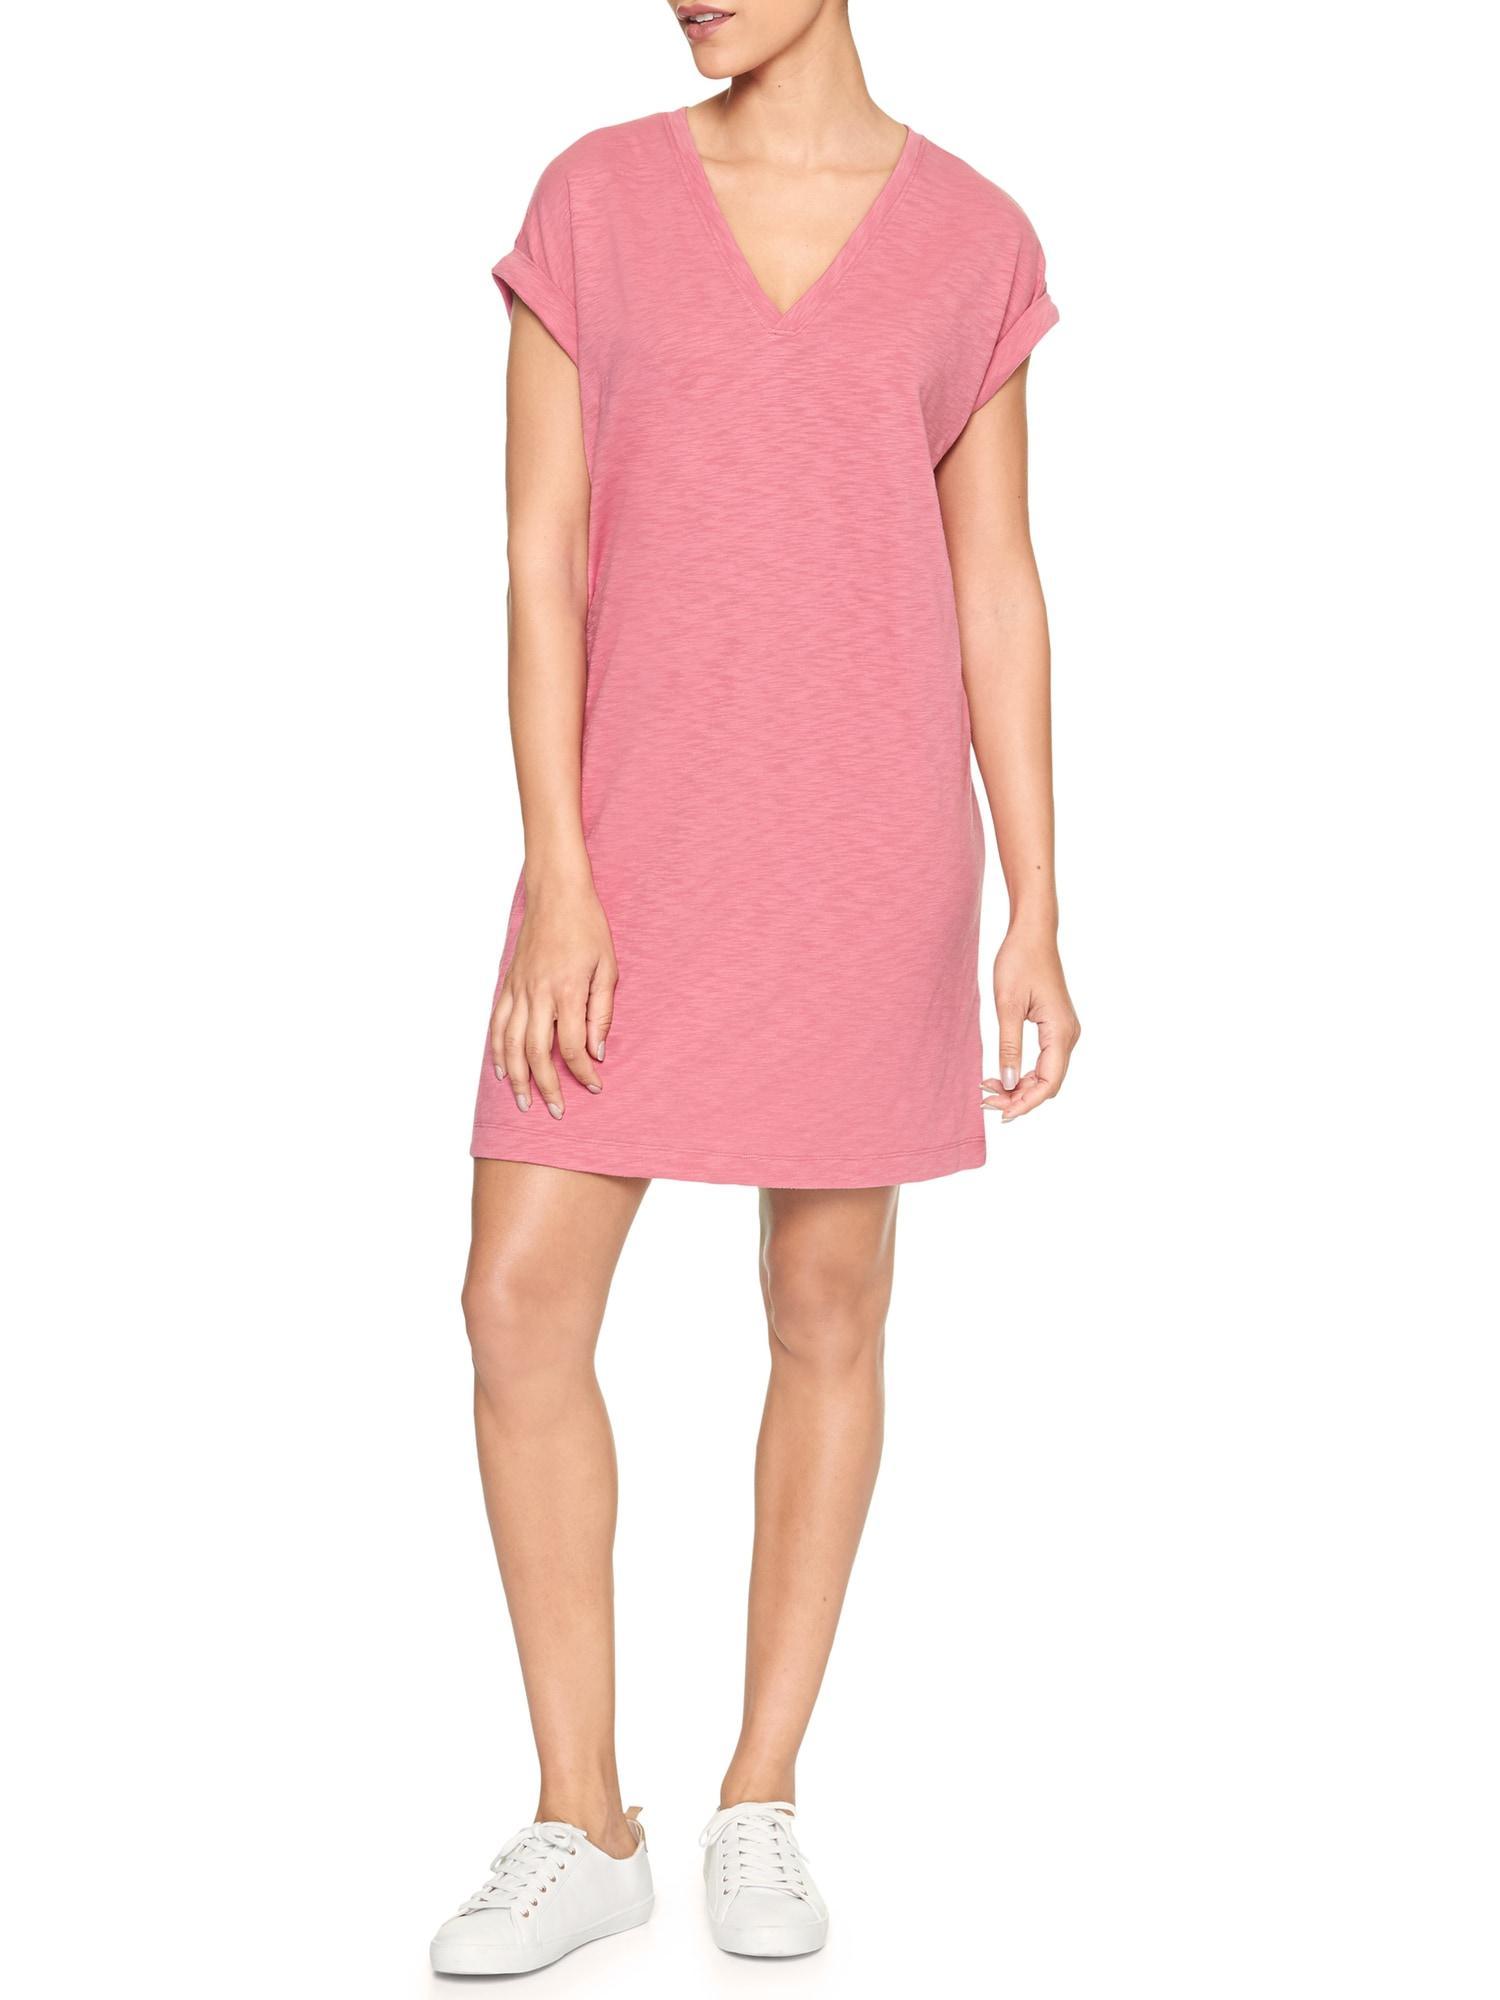 25d3c0de40b0 Lyst - GAP Factory Roll Sleeve Slub T-shirt Dress in Pink